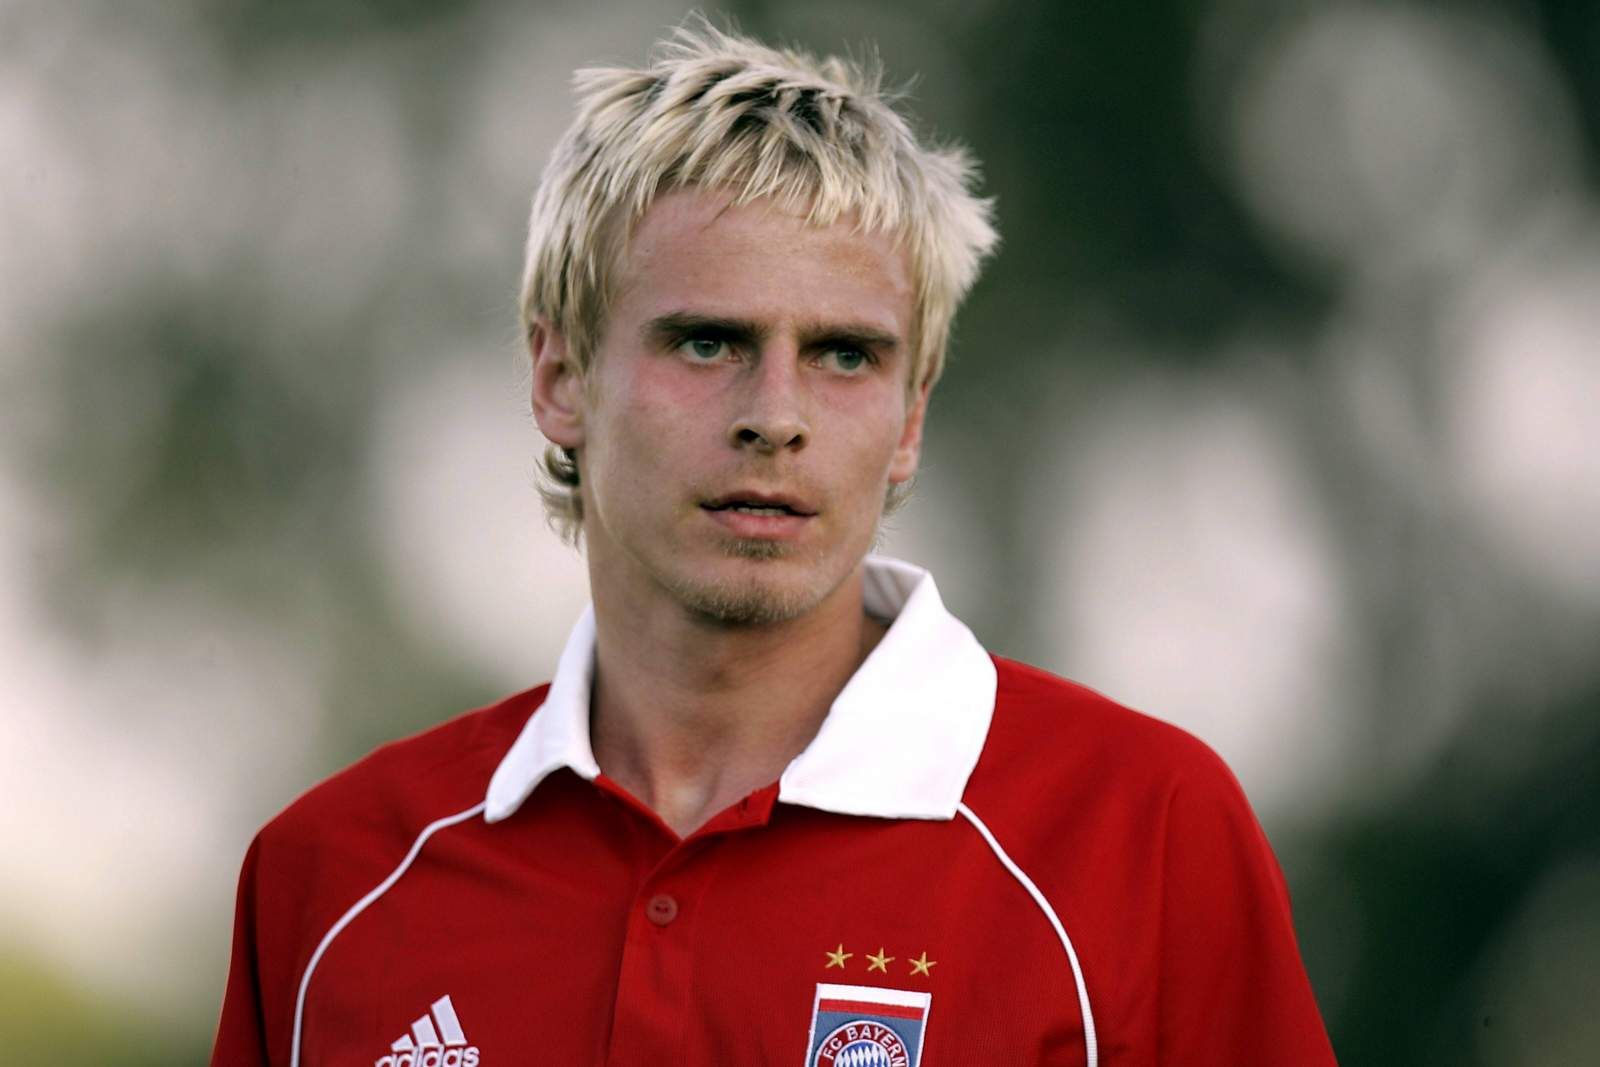 Tobias Rau im Trikot der Münchner Bayern